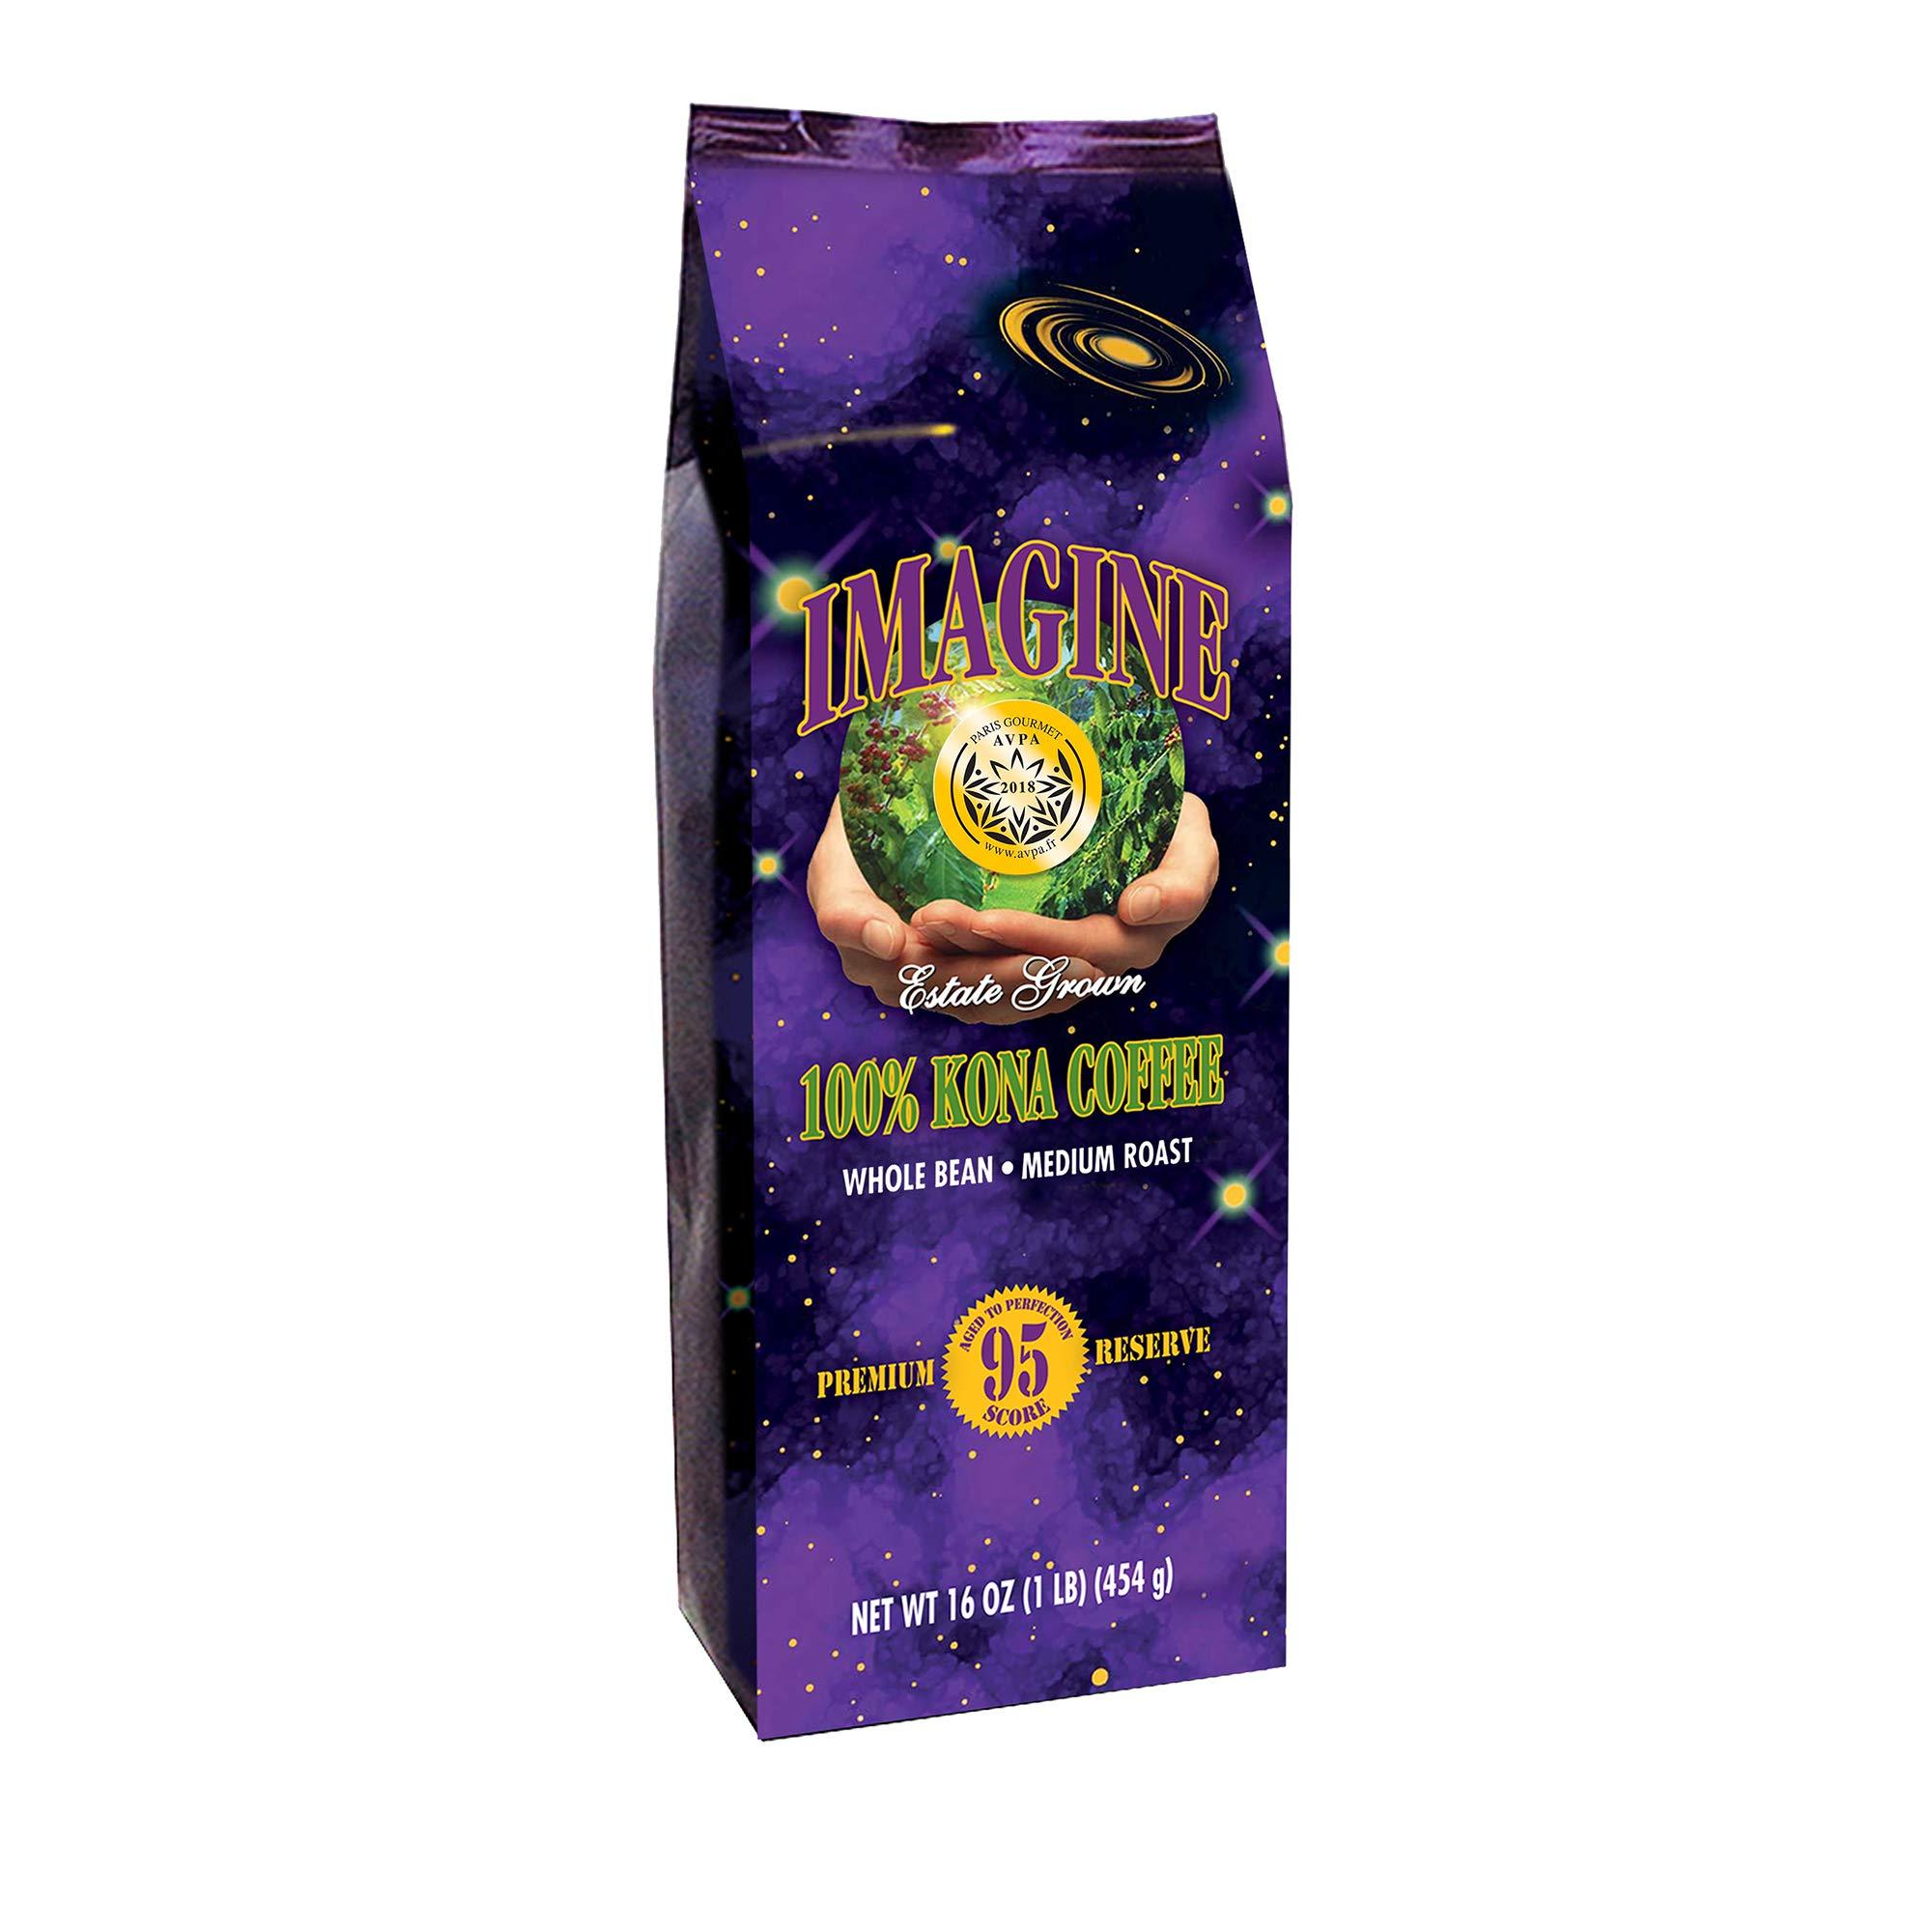 Kona Coffee Beans by Imagine - 100% Kona Hawaii - Medium Dark Roast Whole Bean - 16 oz Bag